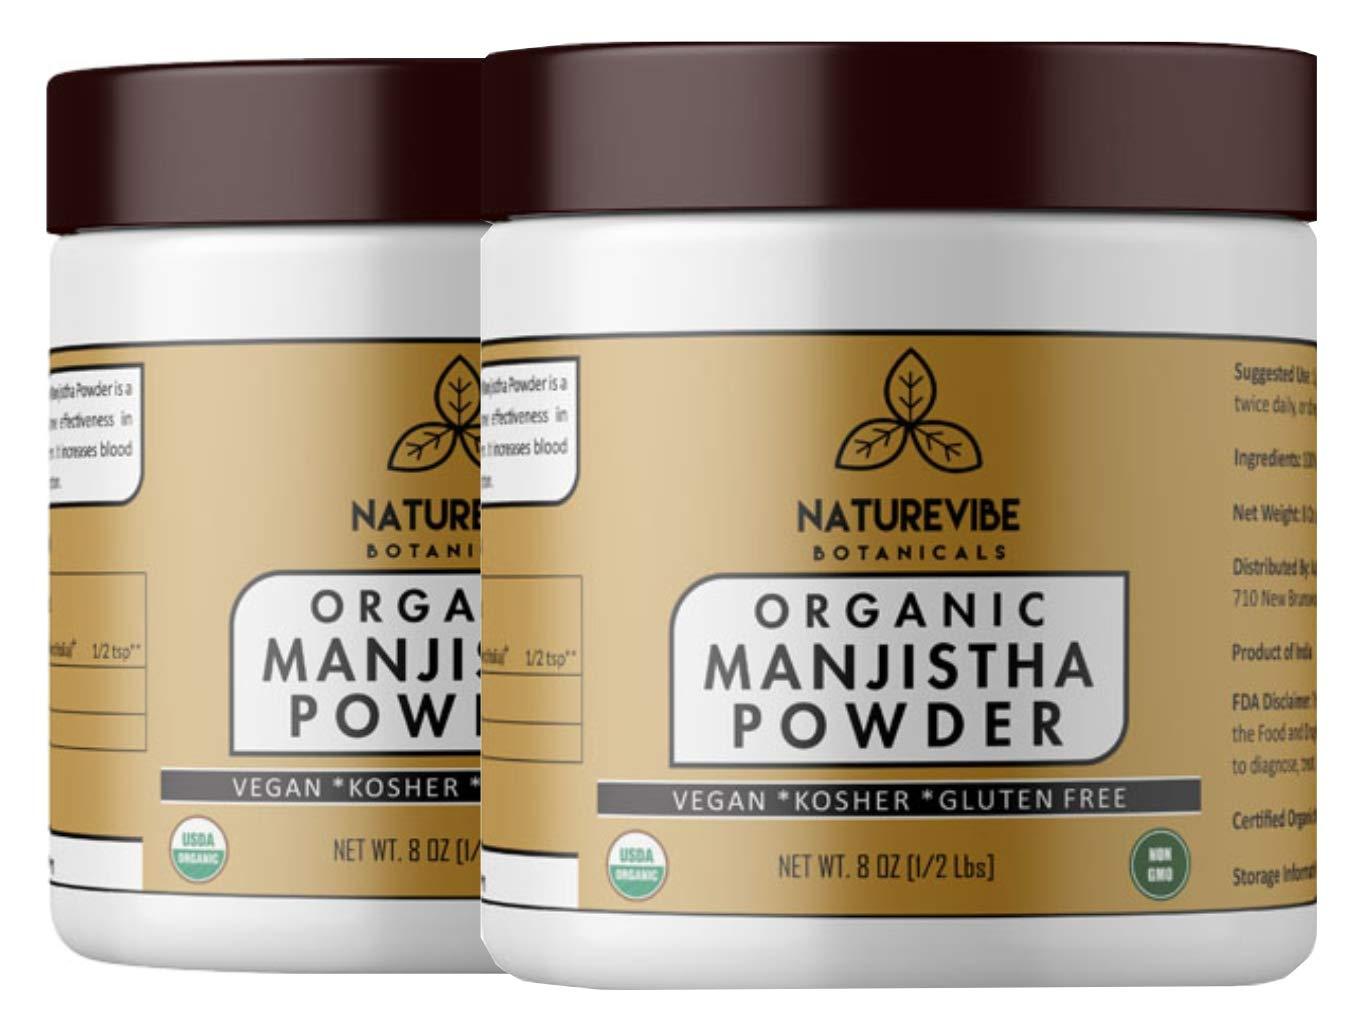 Naturevibe Botanicals Organic Manjistha Powder 16 Oz(2 Packs of 8 Oz Each) - Non GMO, Gluten Free and Kosher | Rubia Cordifolia | Promotes Healthy and Clear Skin.